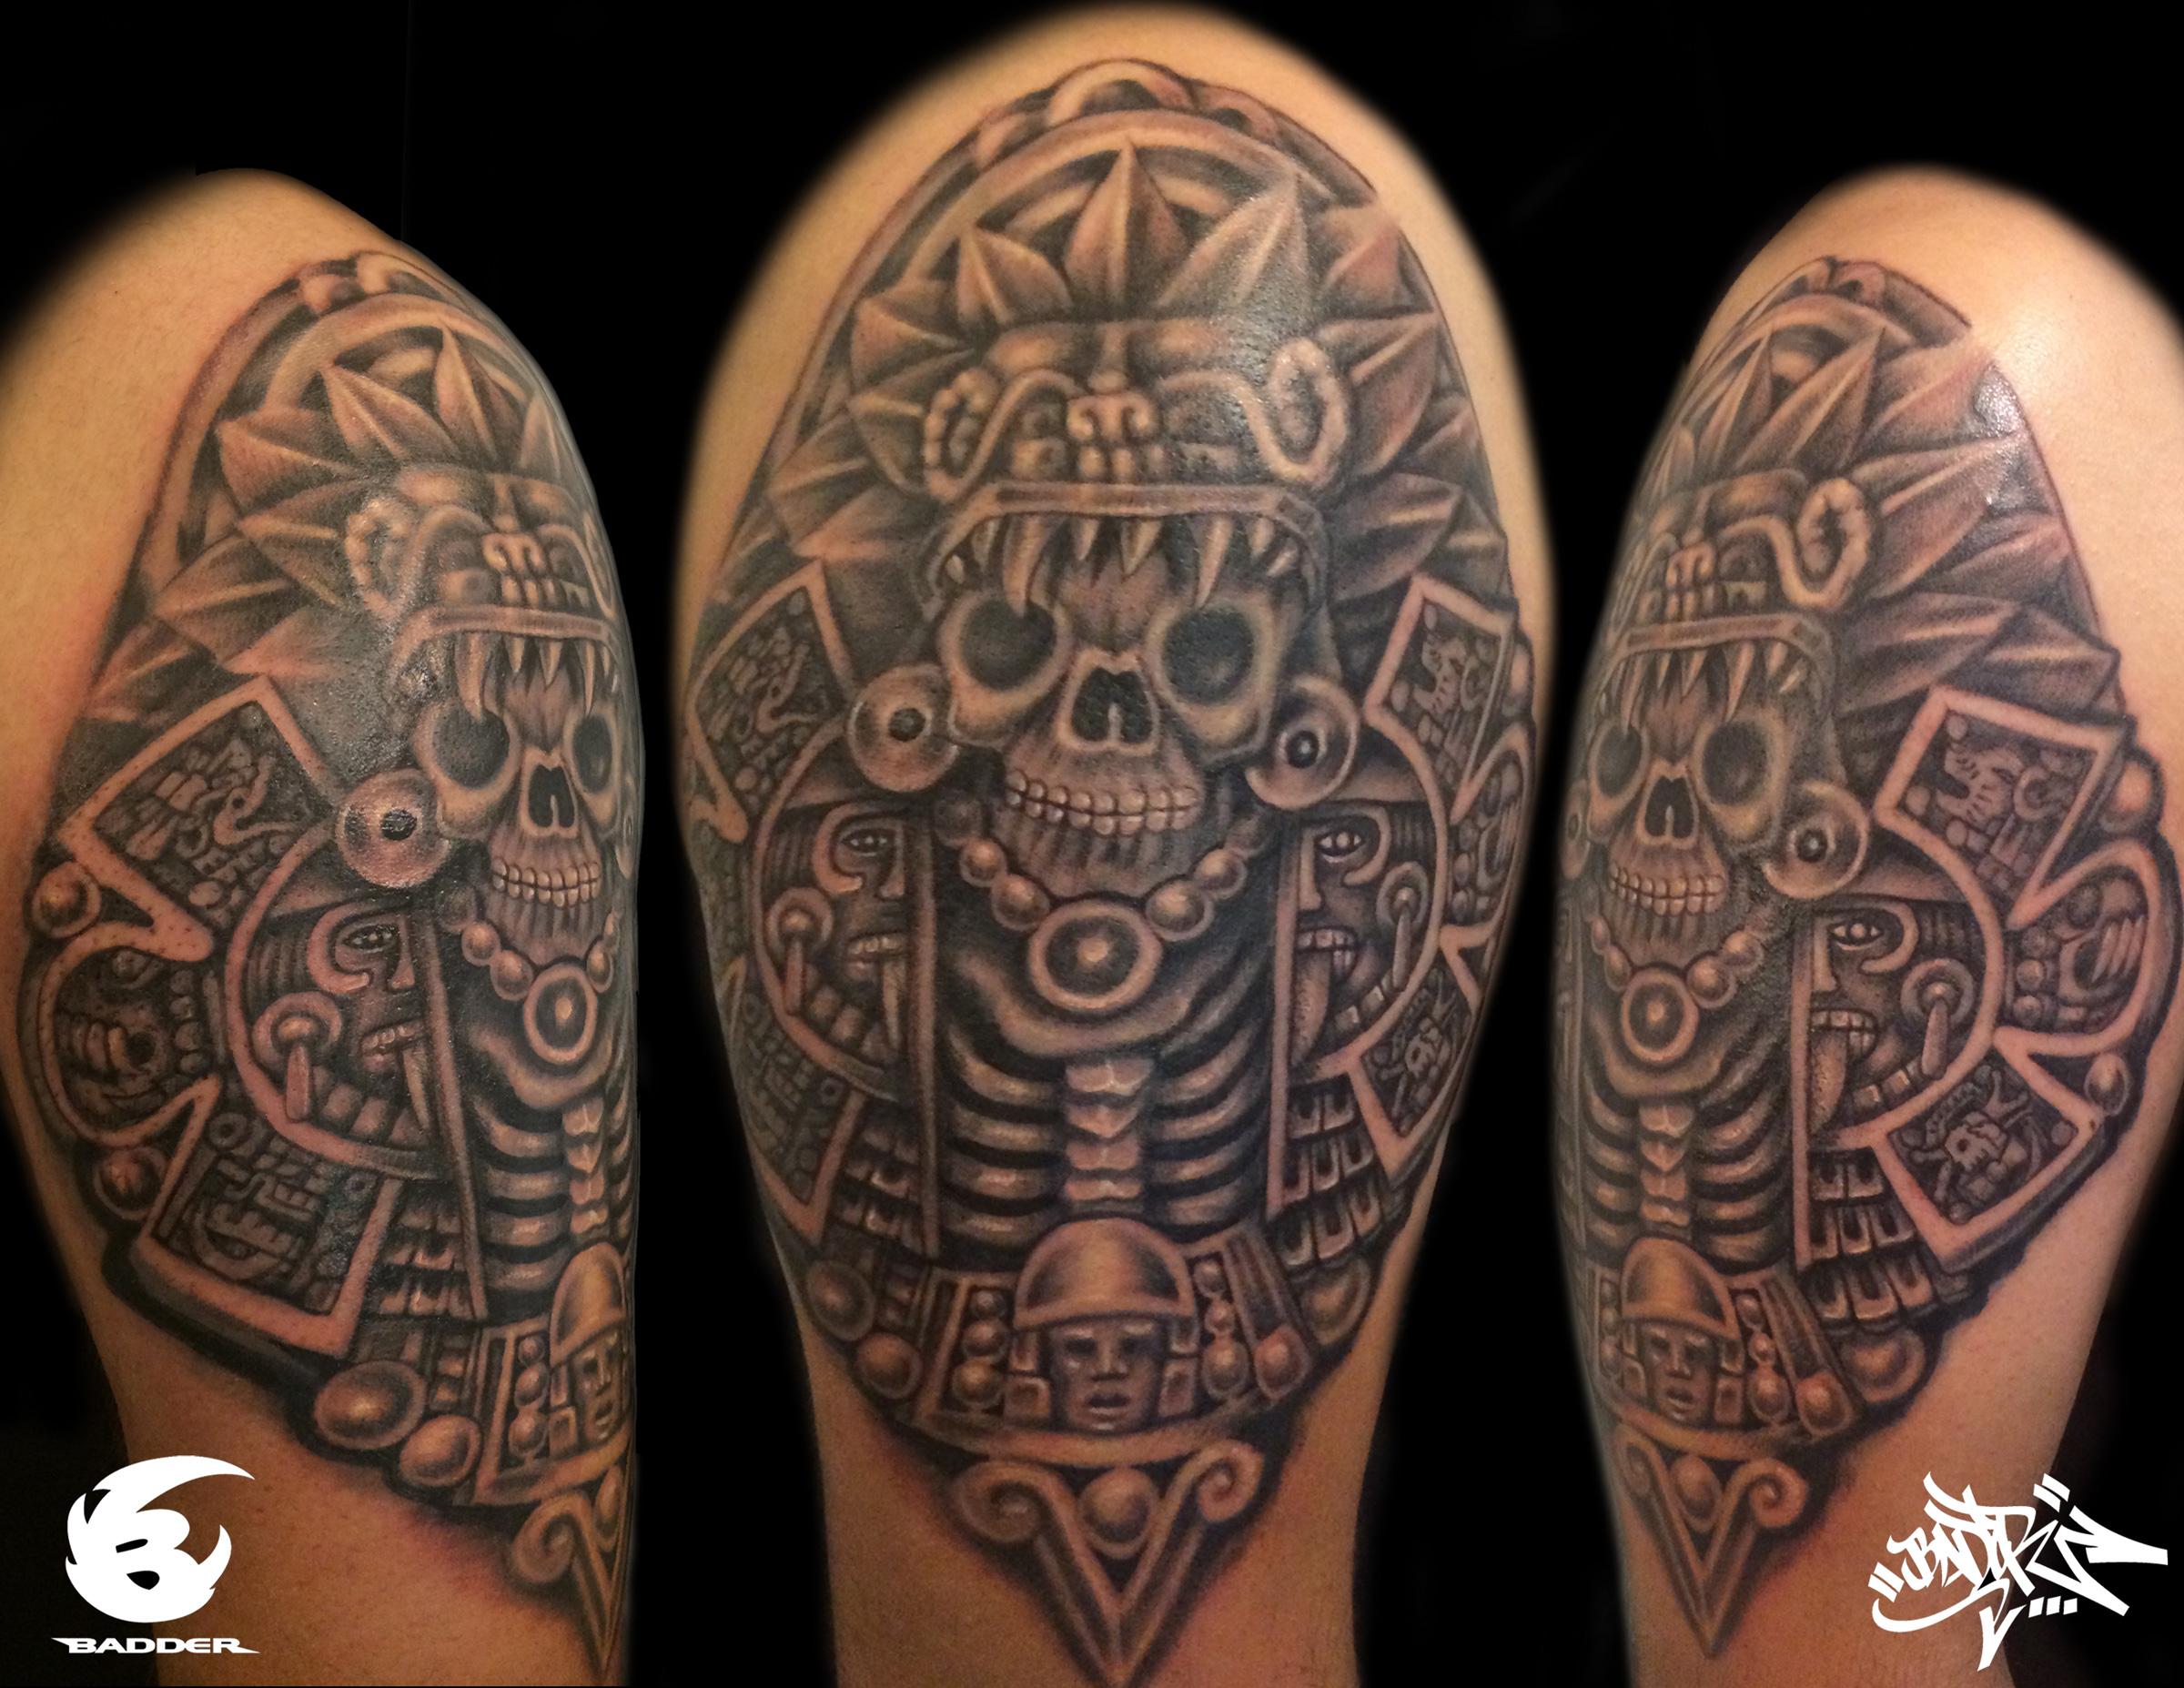 Badder fusion-azteca-web